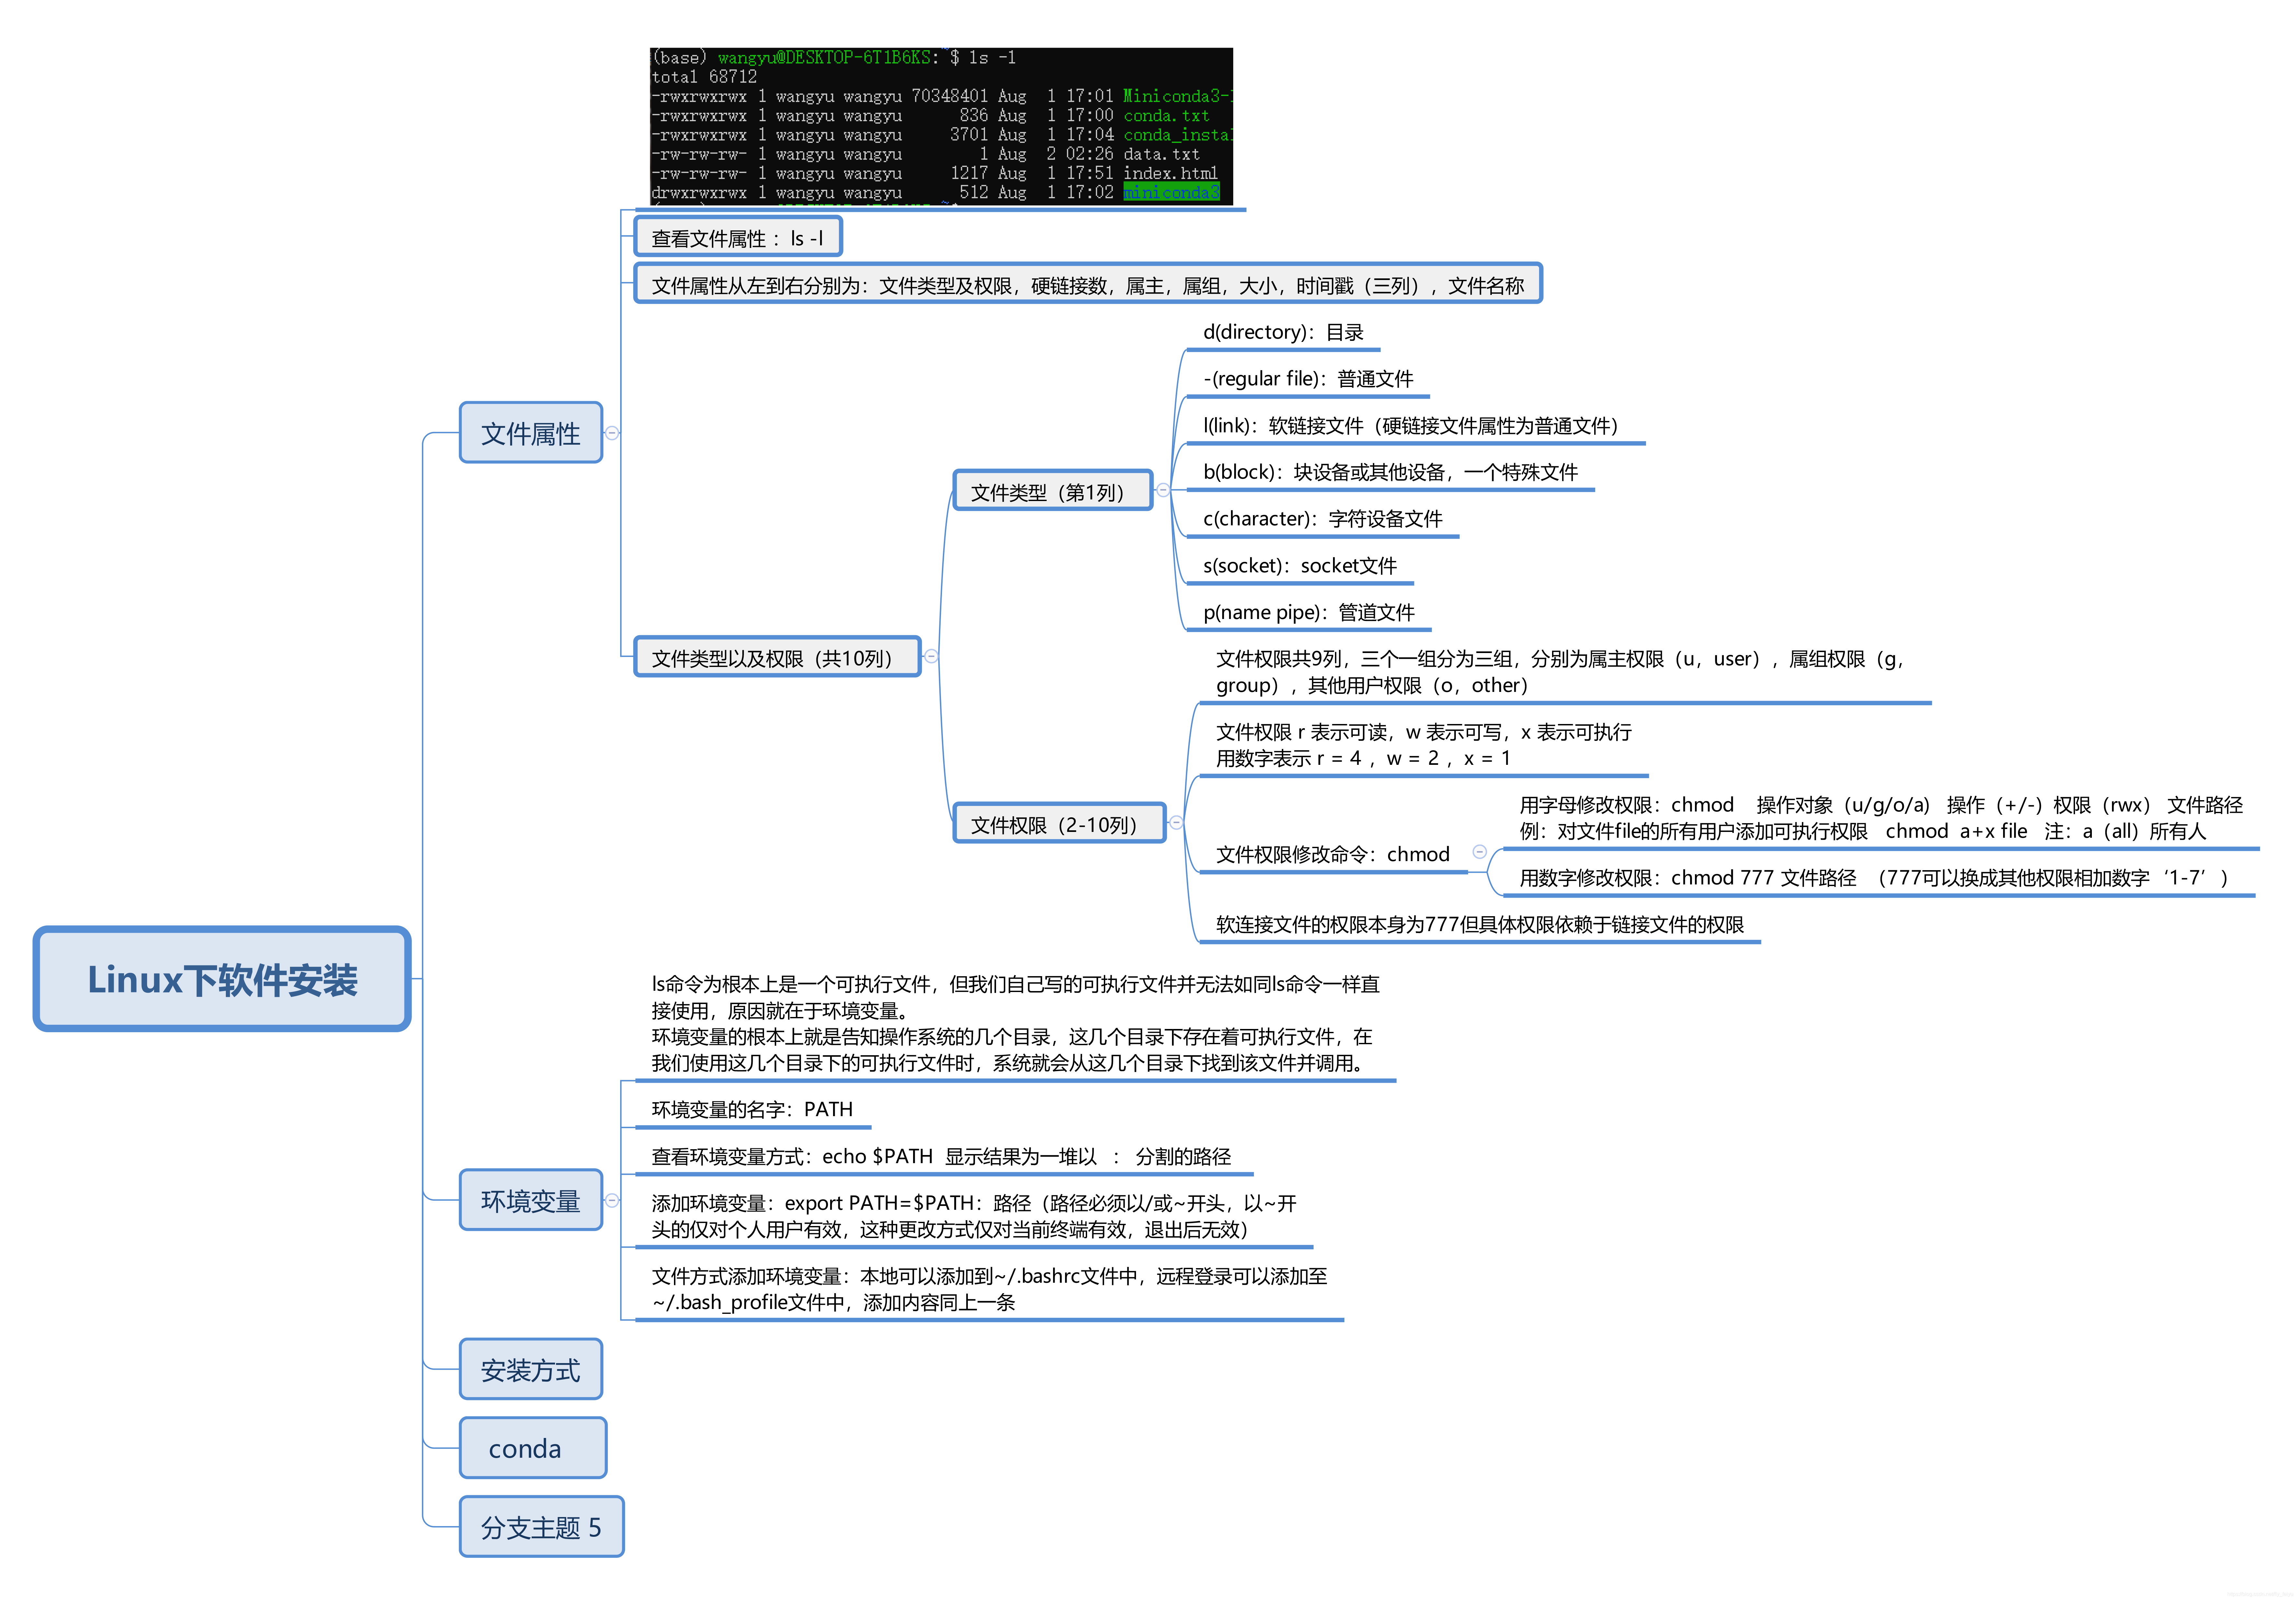 Linux软件安装相关